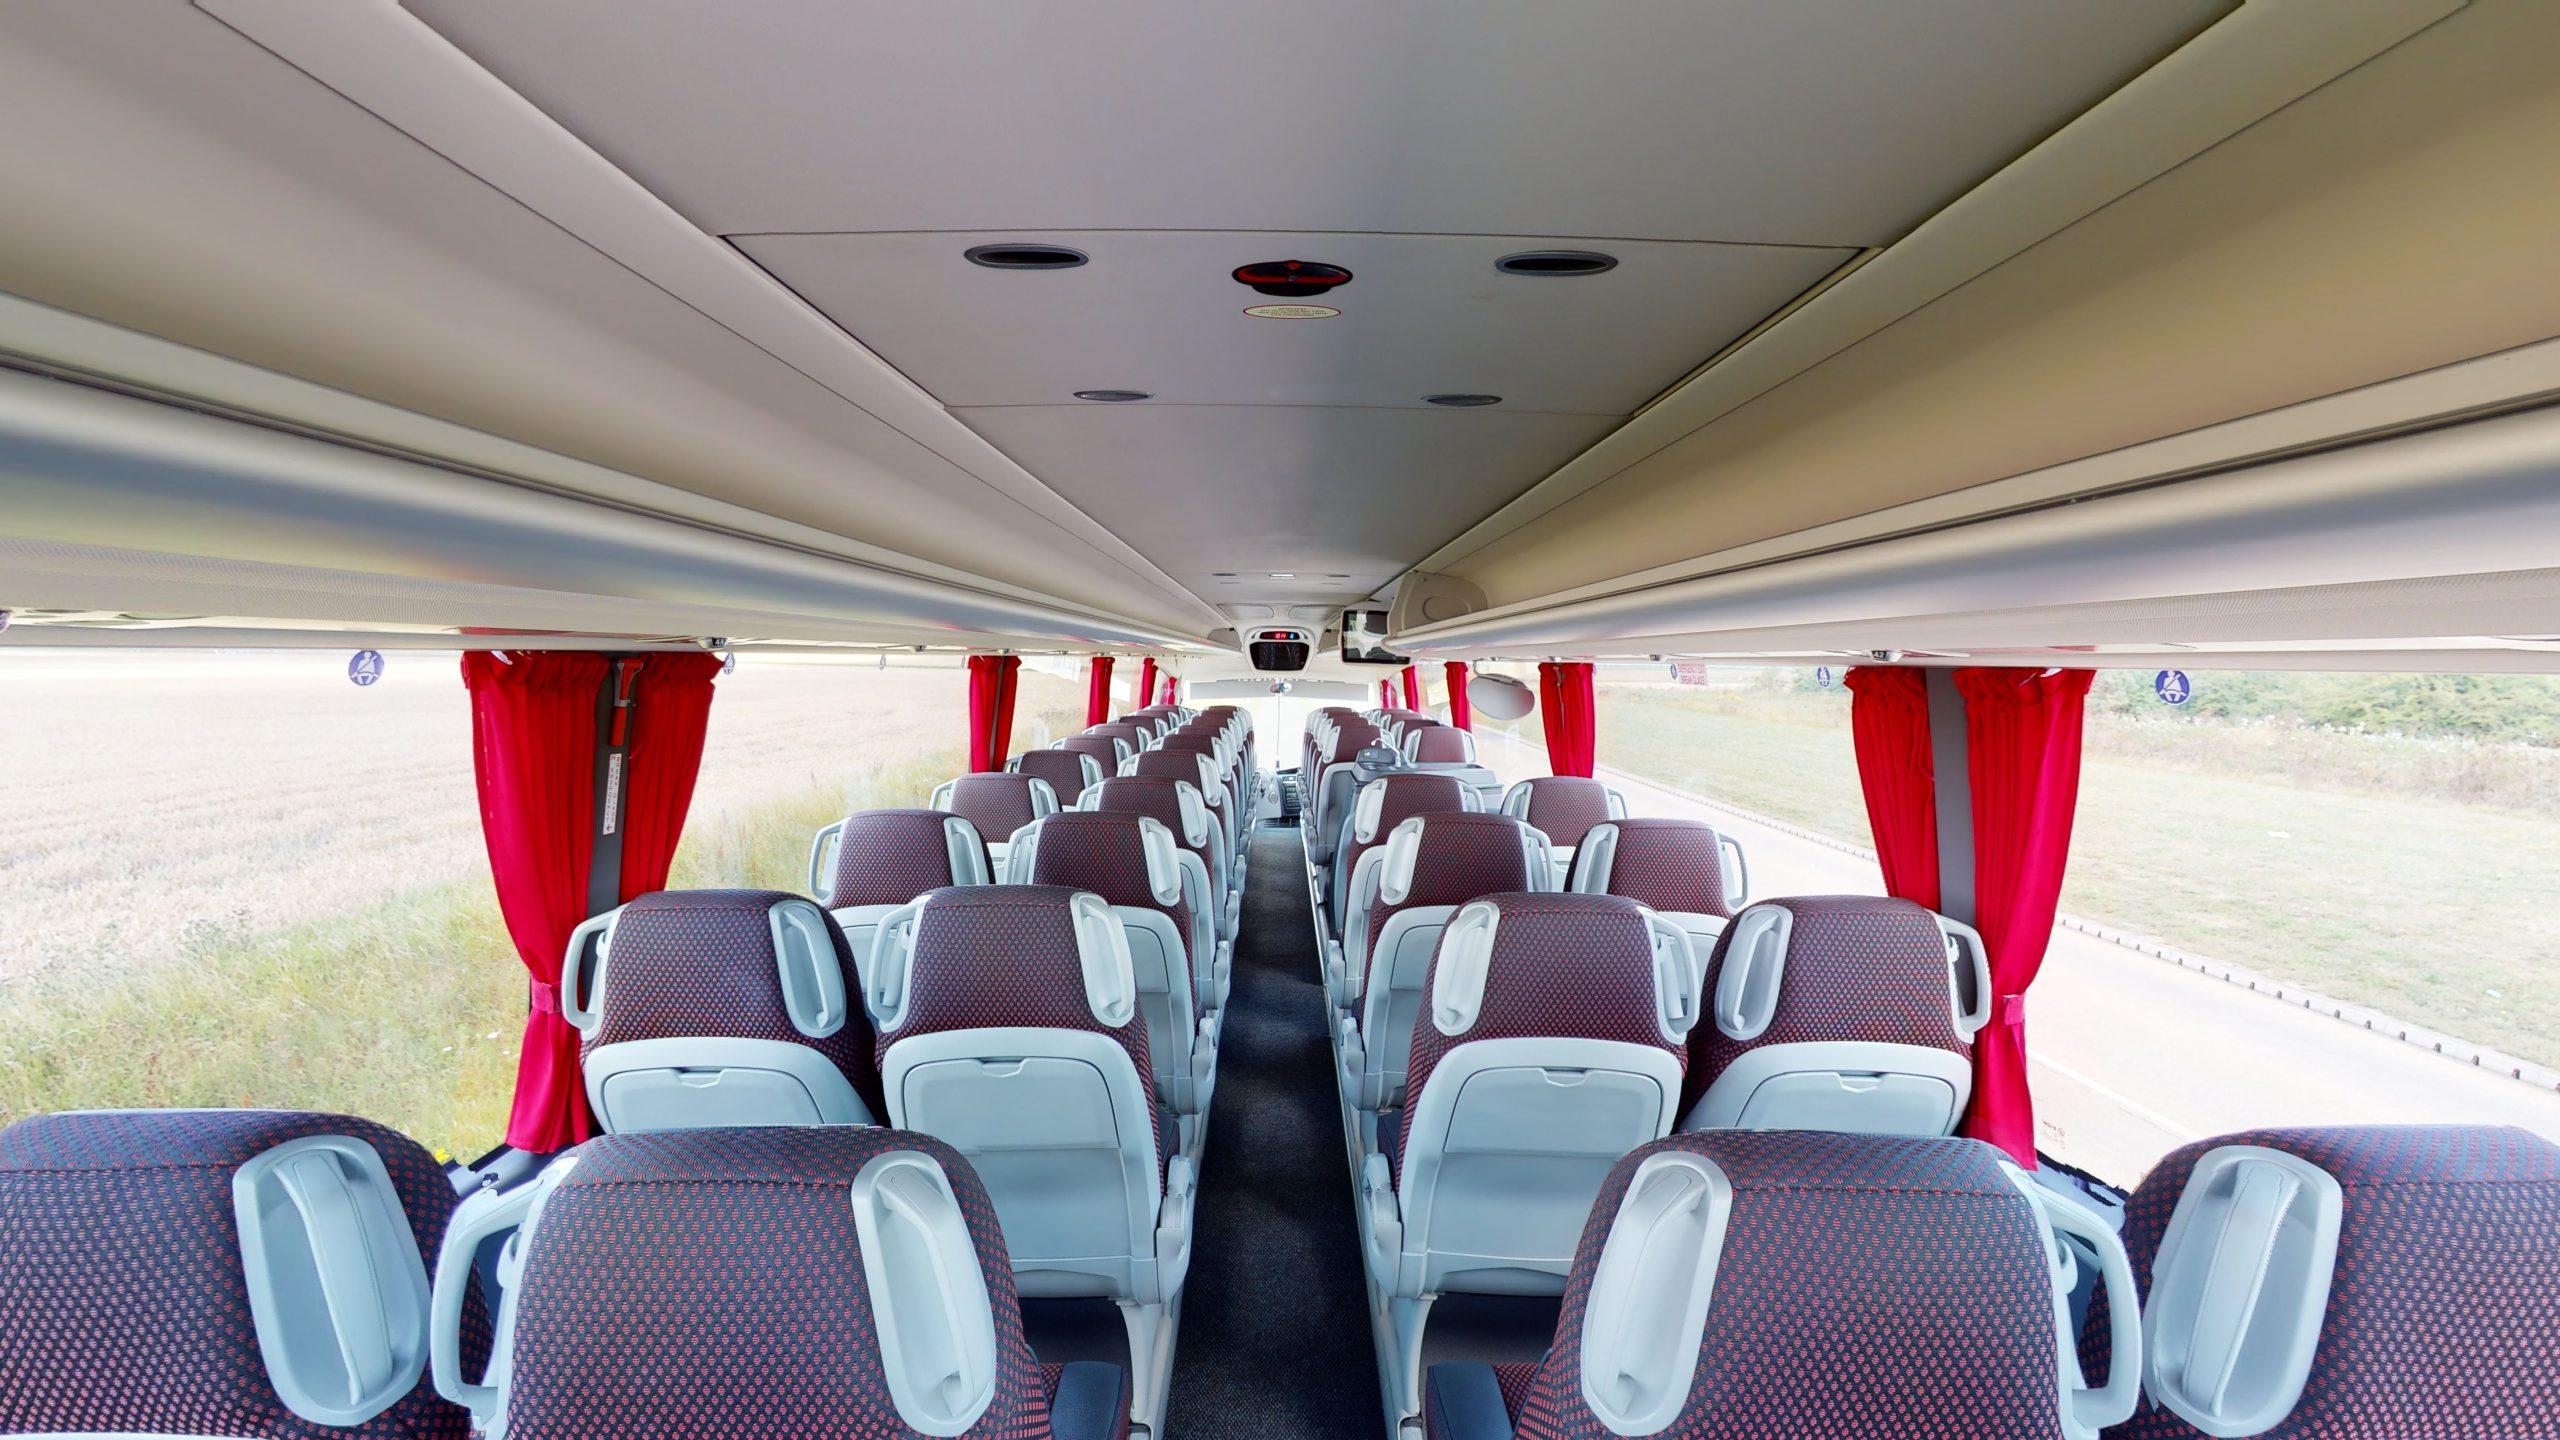 farleigh coaches 53 seater coach